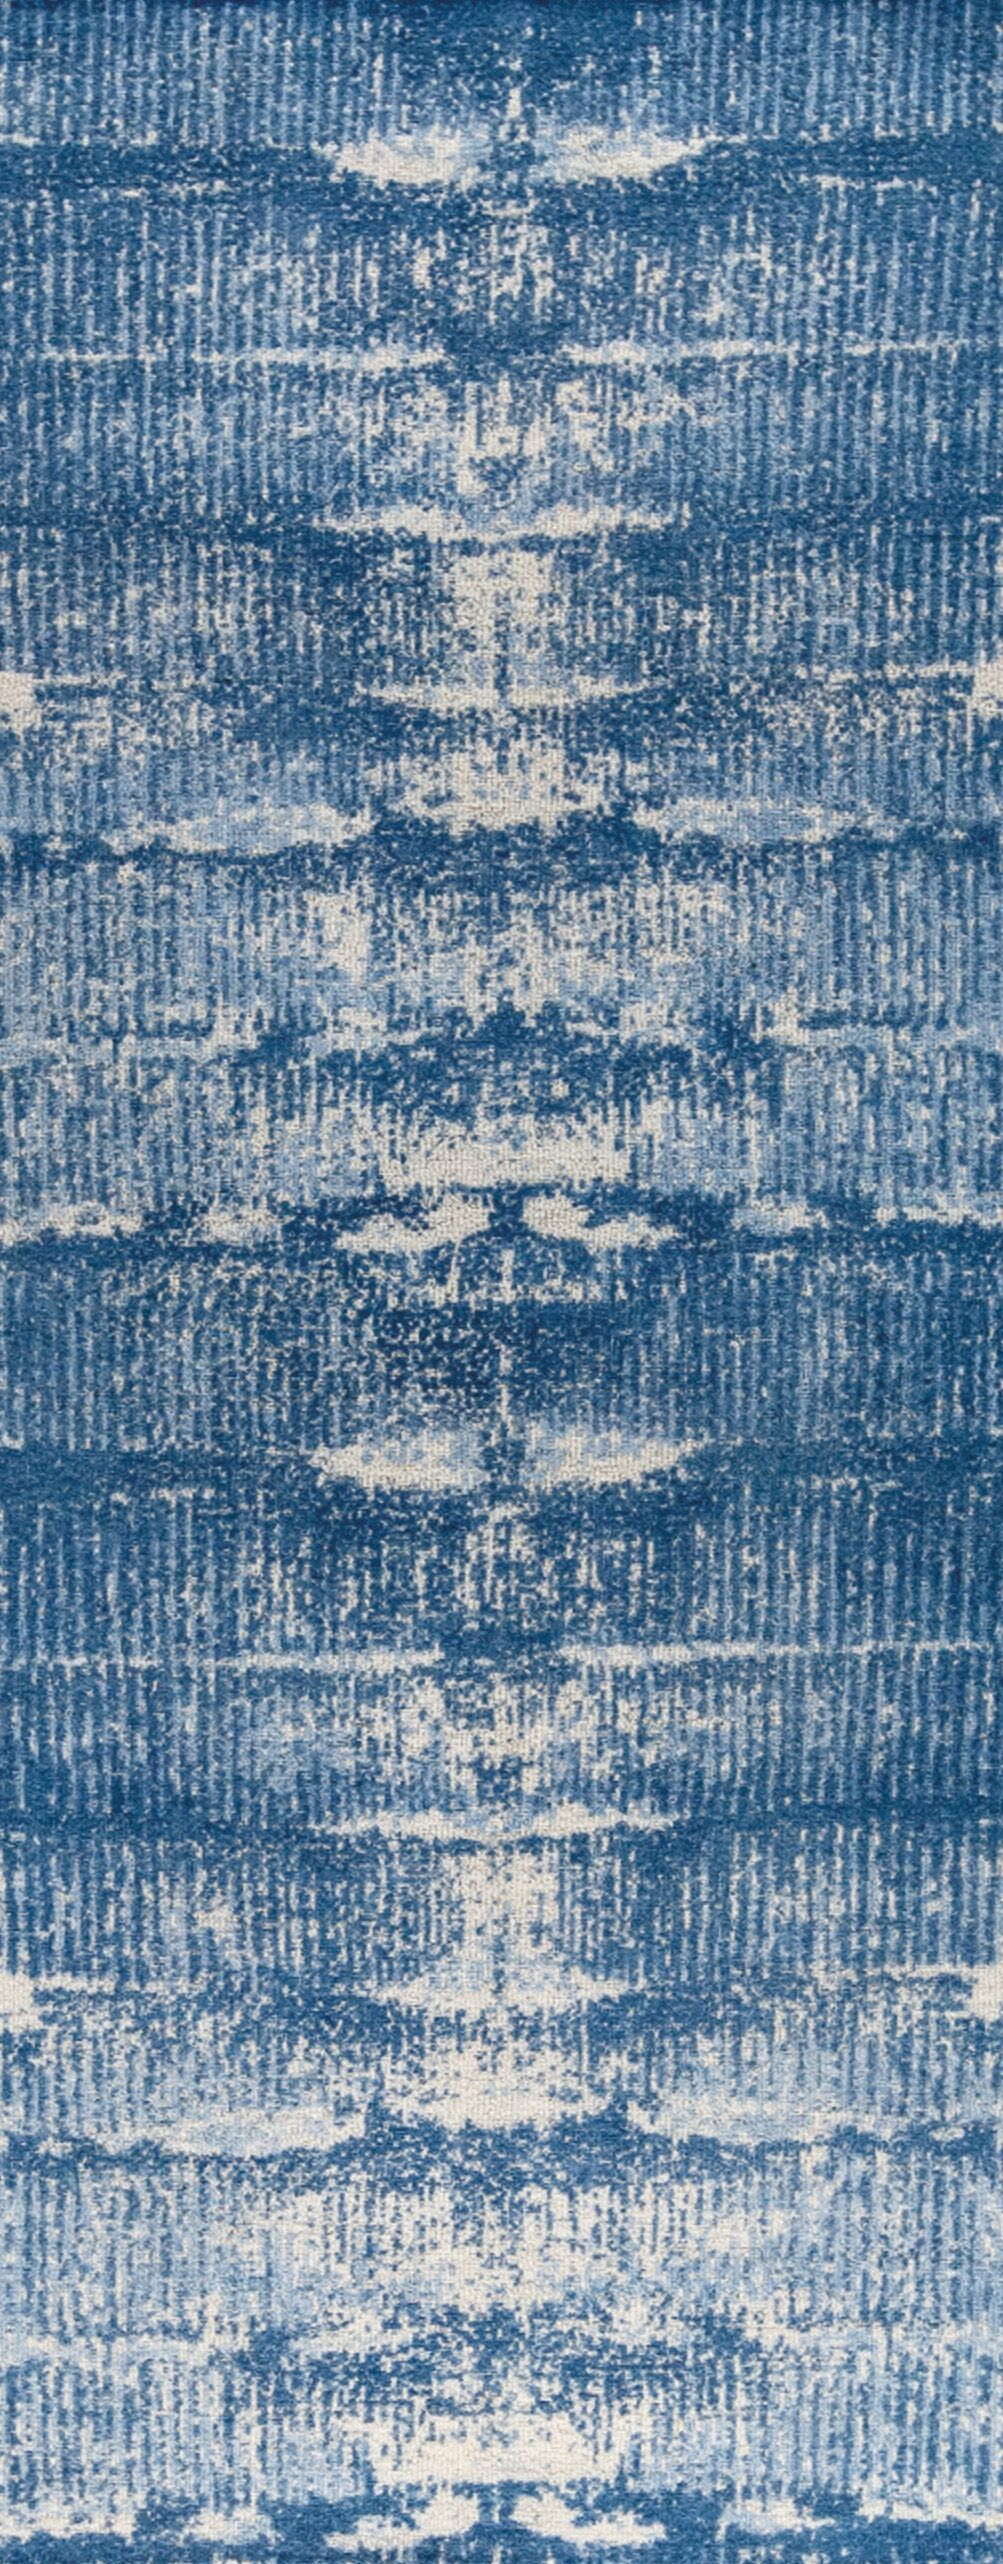 Jackson Hand-Woven Blue Area Rug Rug Size: 5' x 8'